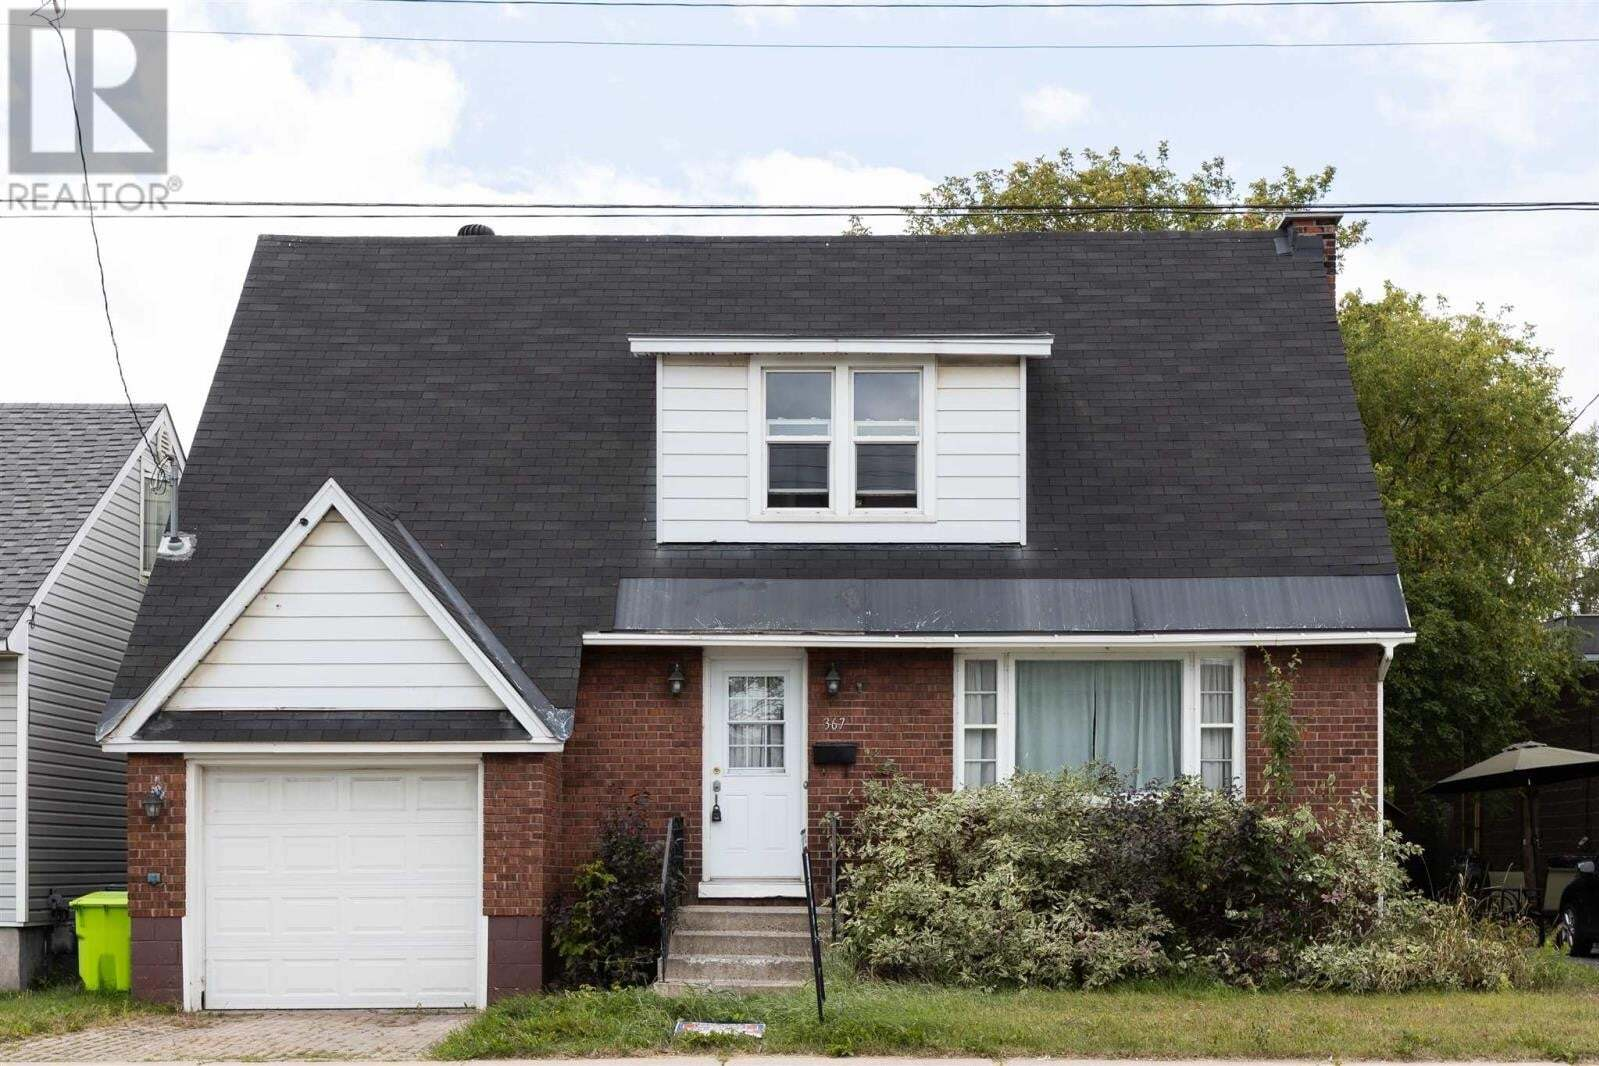 House for sale at 367 Korah Rd Sault Ste. Marie Ontario - MLS: SM129346